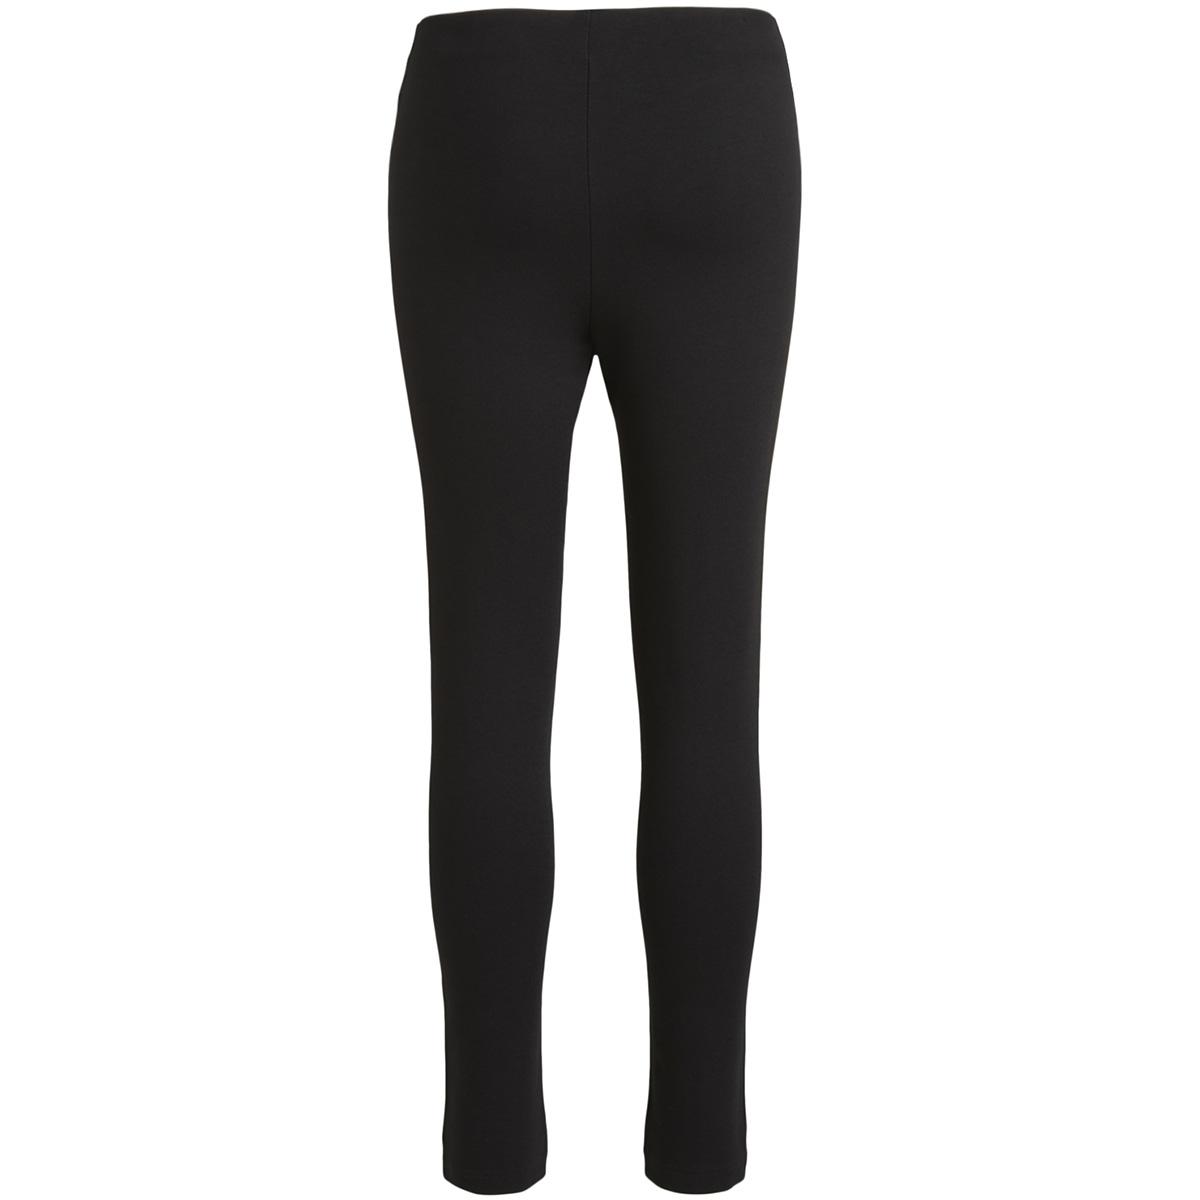 vifellow legging - noos 14044488 vila legging black